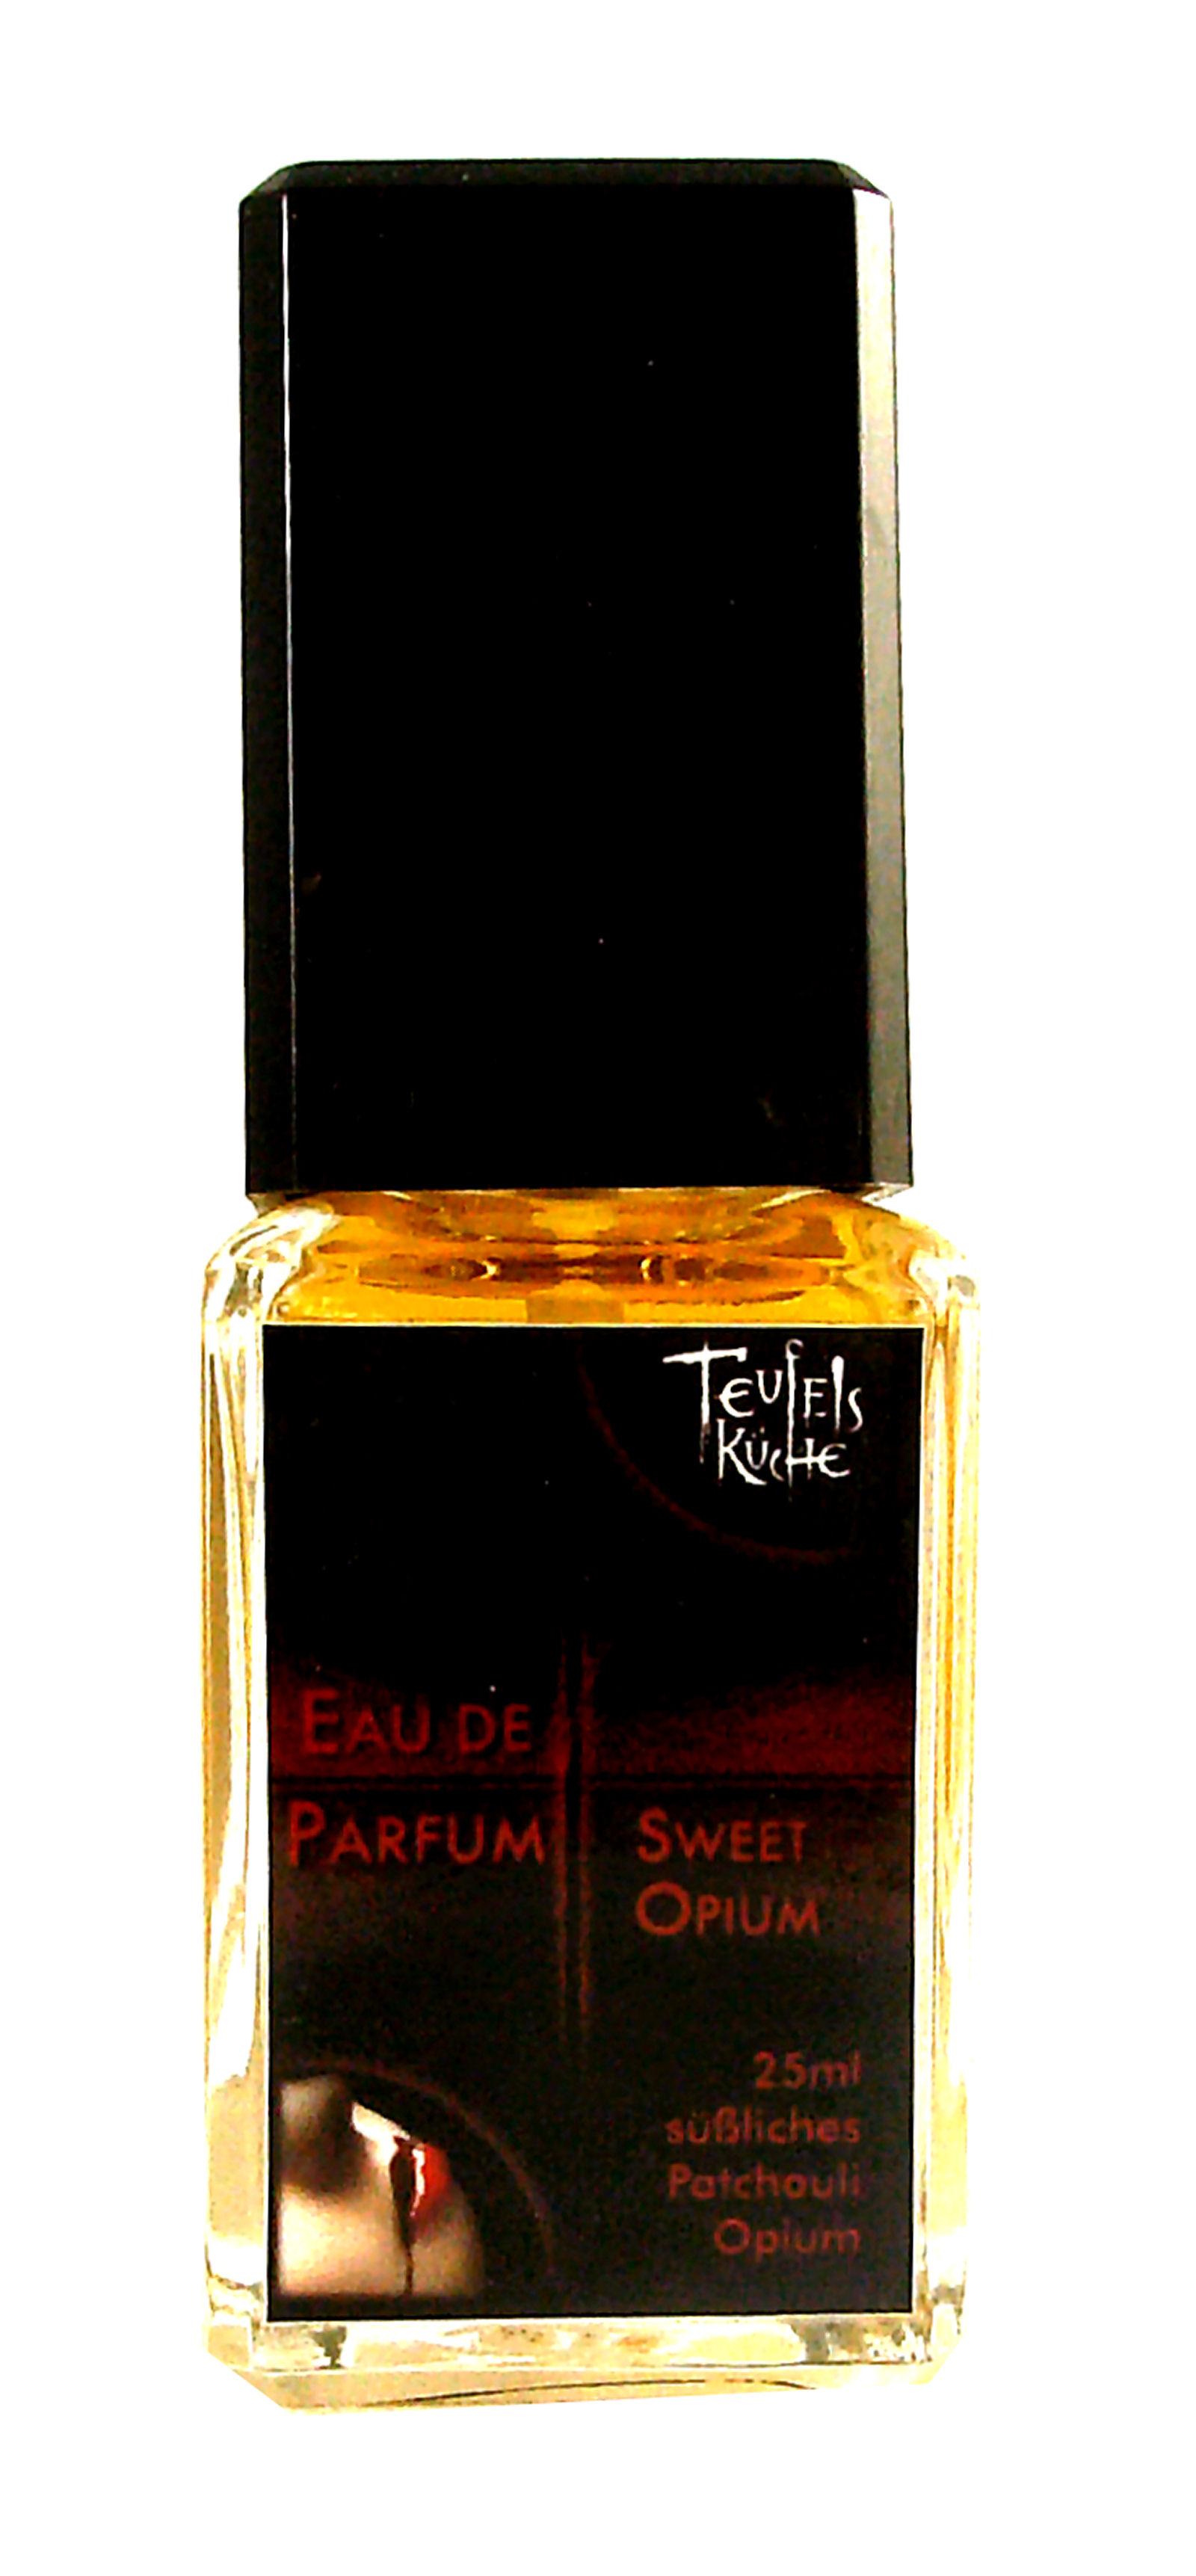 Eau De Parfum Patchouli Sweet Opium 25ml und Parfumflakon leer